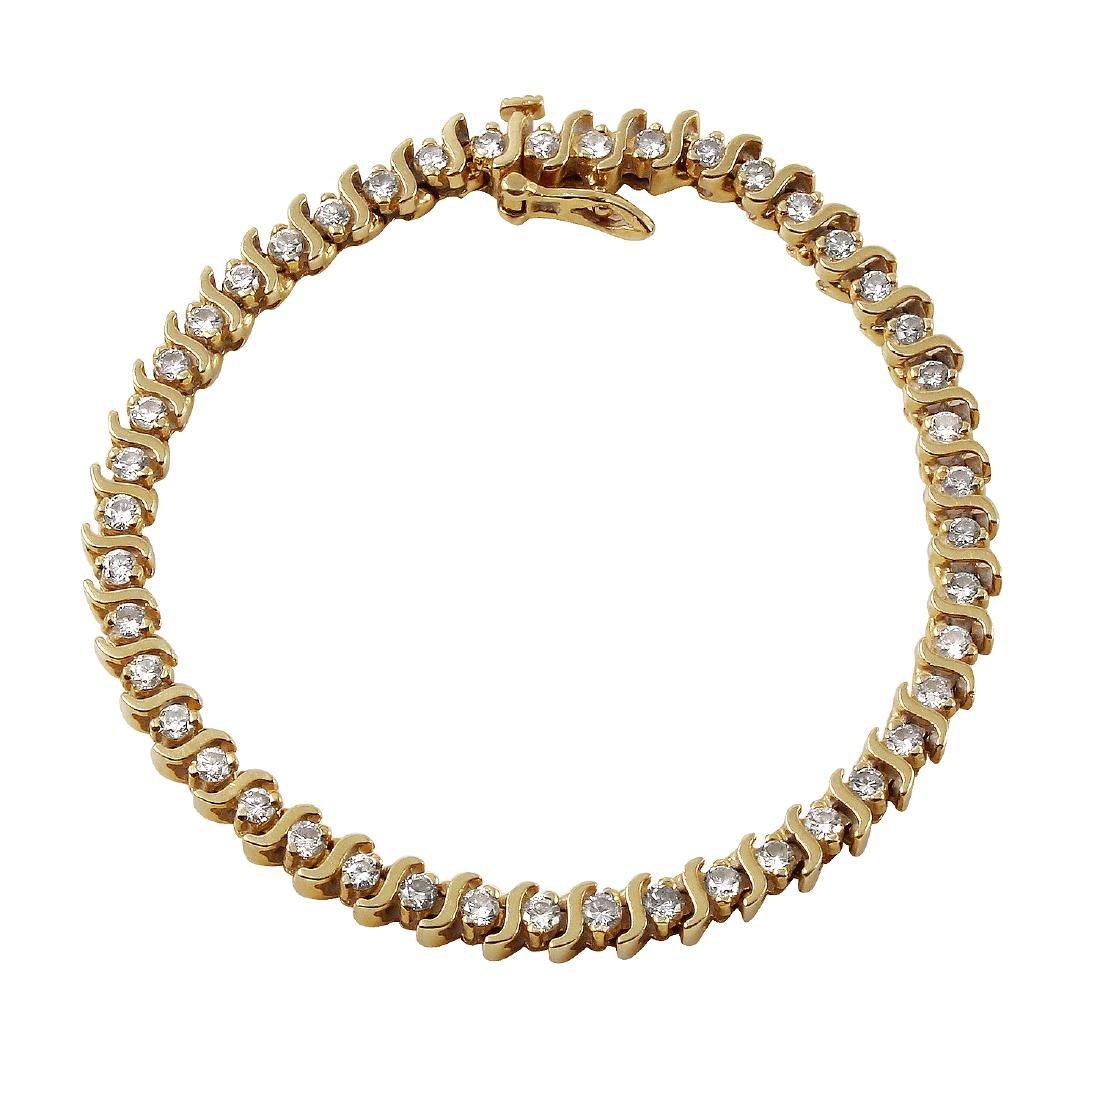 14KT Yellow Gold Diamond Tennis Bracelet